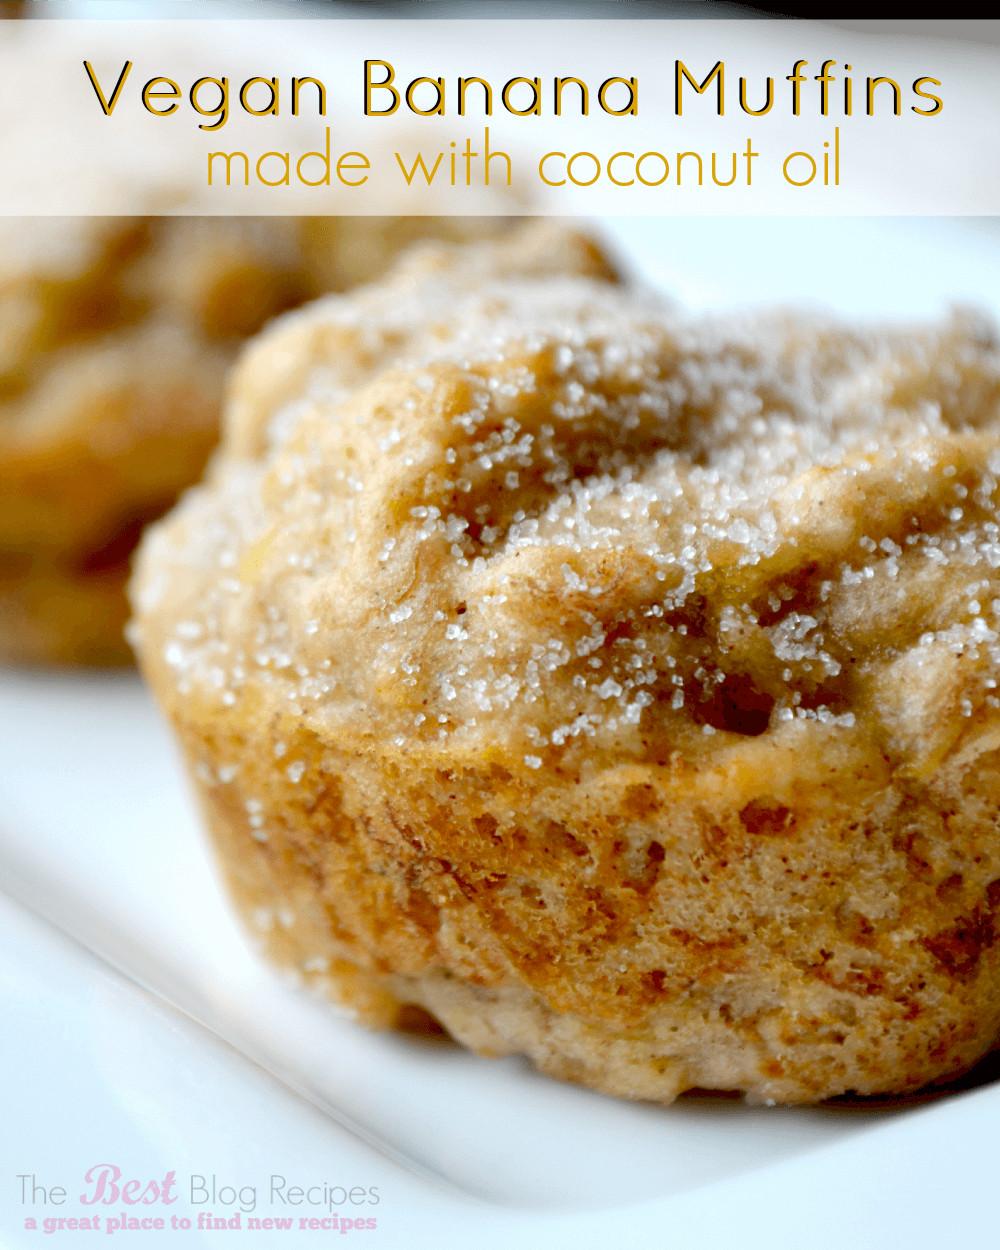 Vegan Banana Recipes  Vegan Banana Muffins made w Coconut Oil